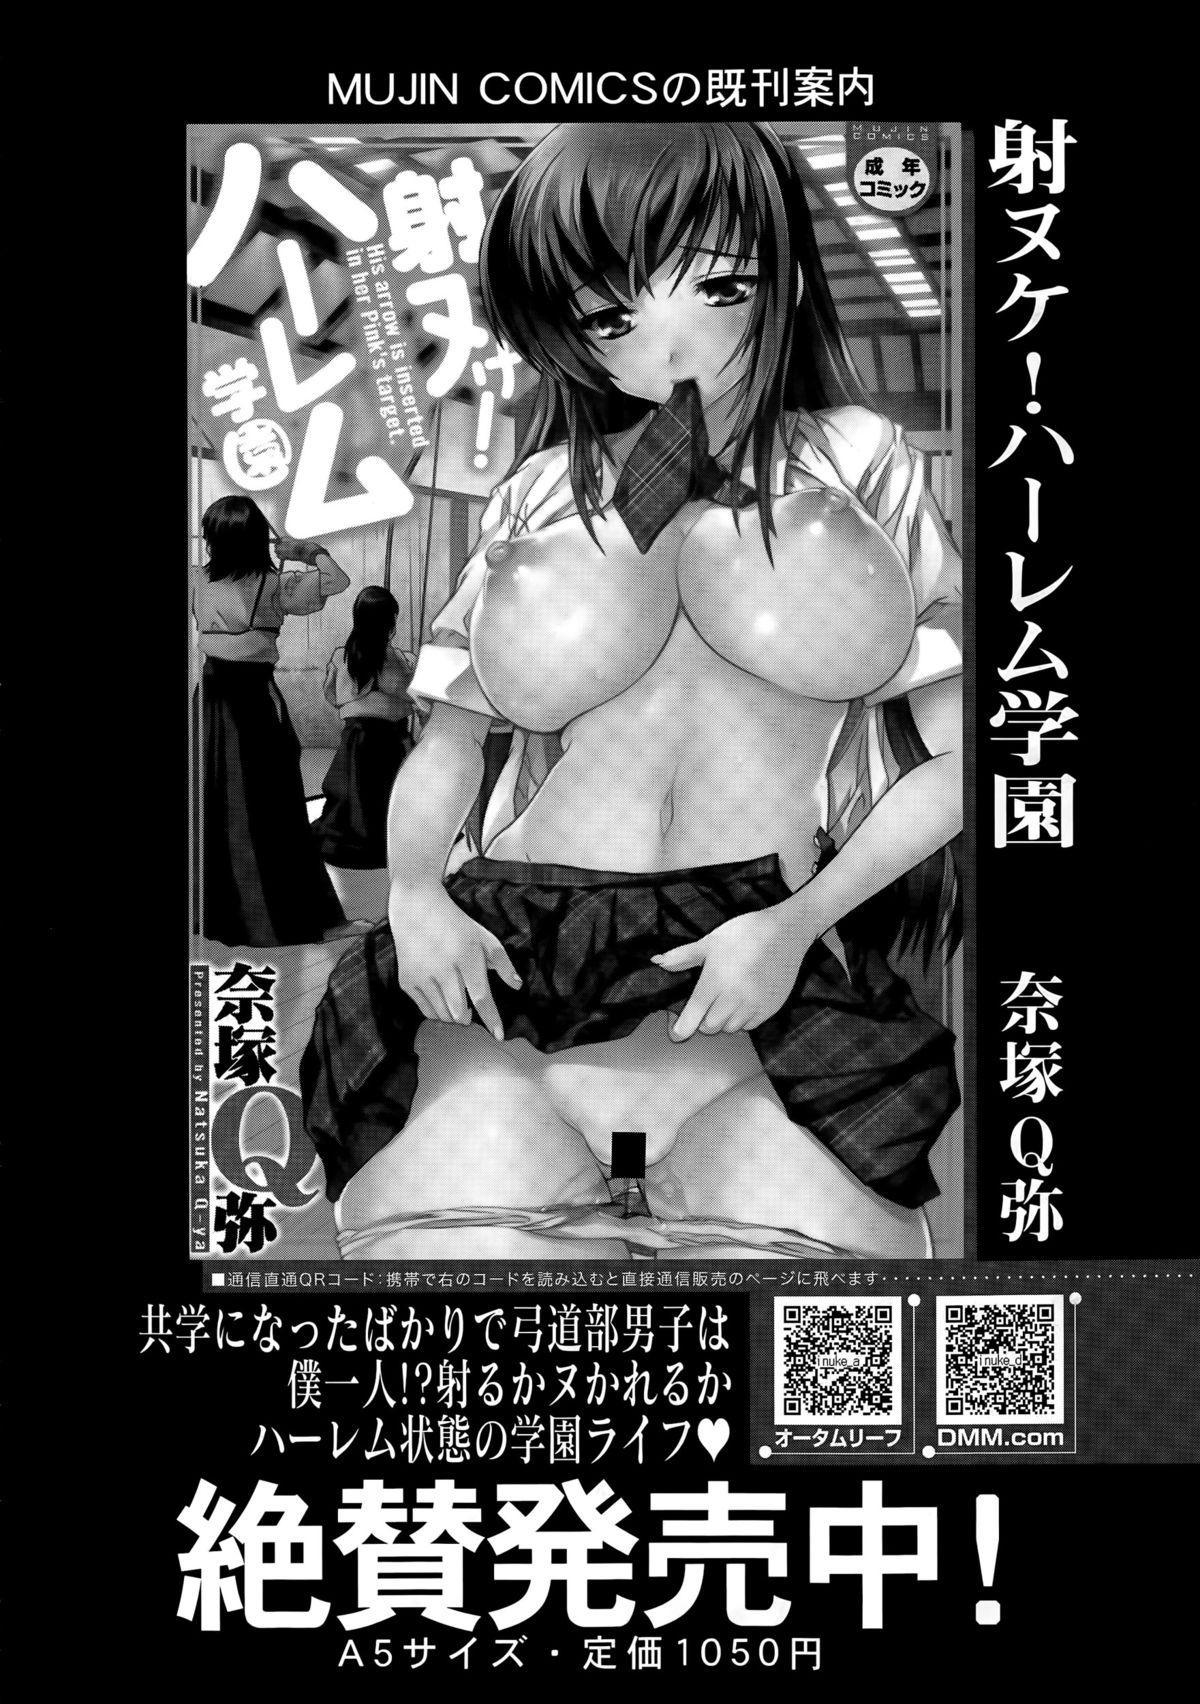 COMIC Mugen Tensei 2015-05 304